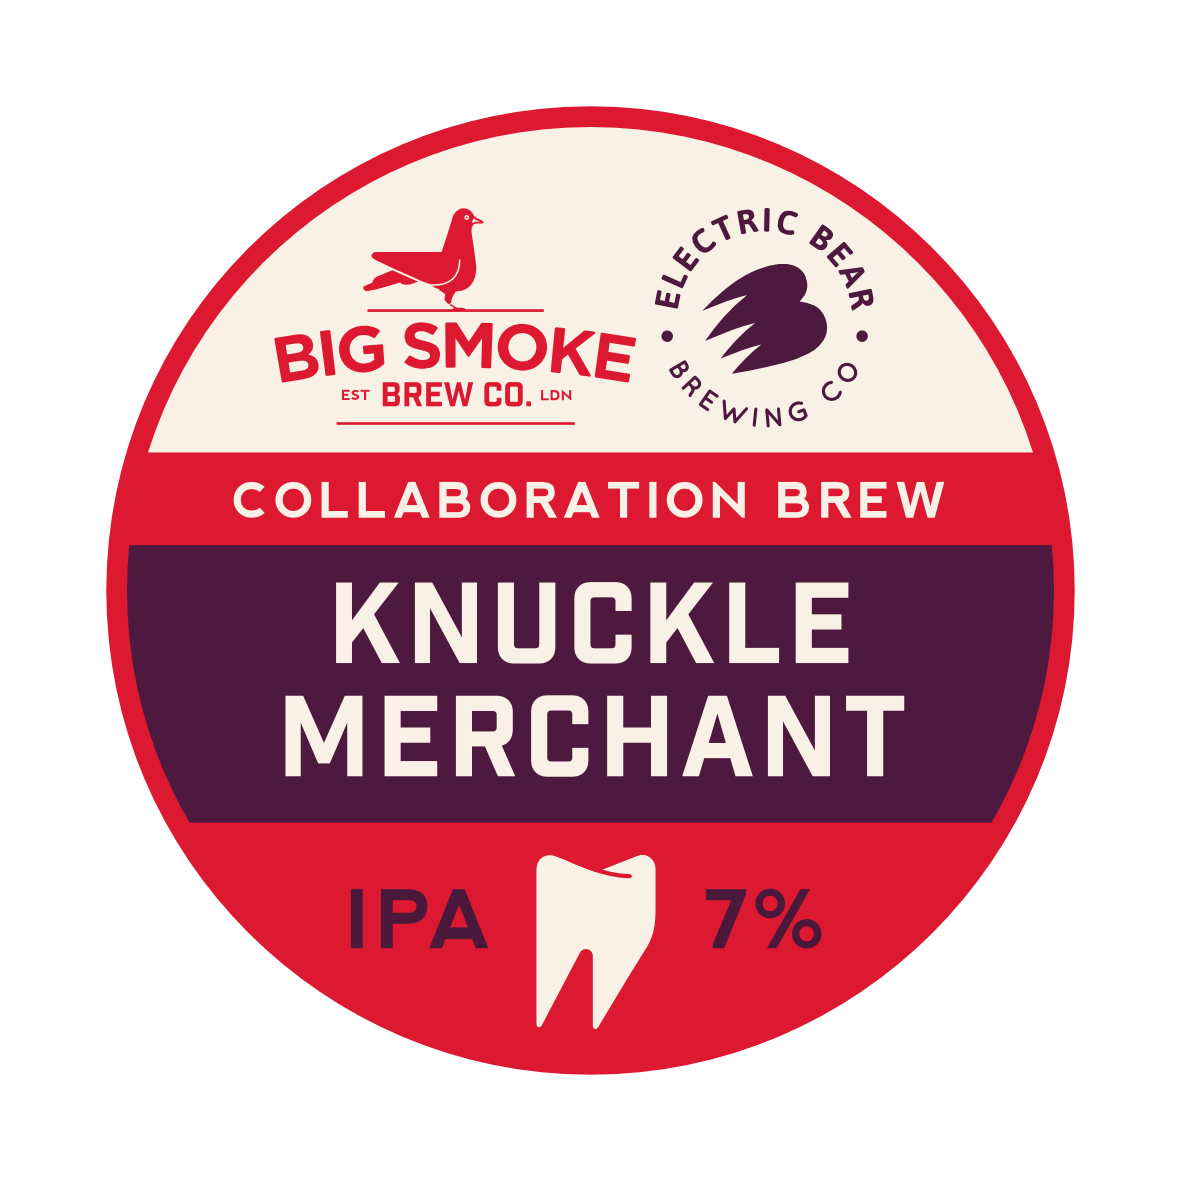 Knuckle Merchant badge.jpg